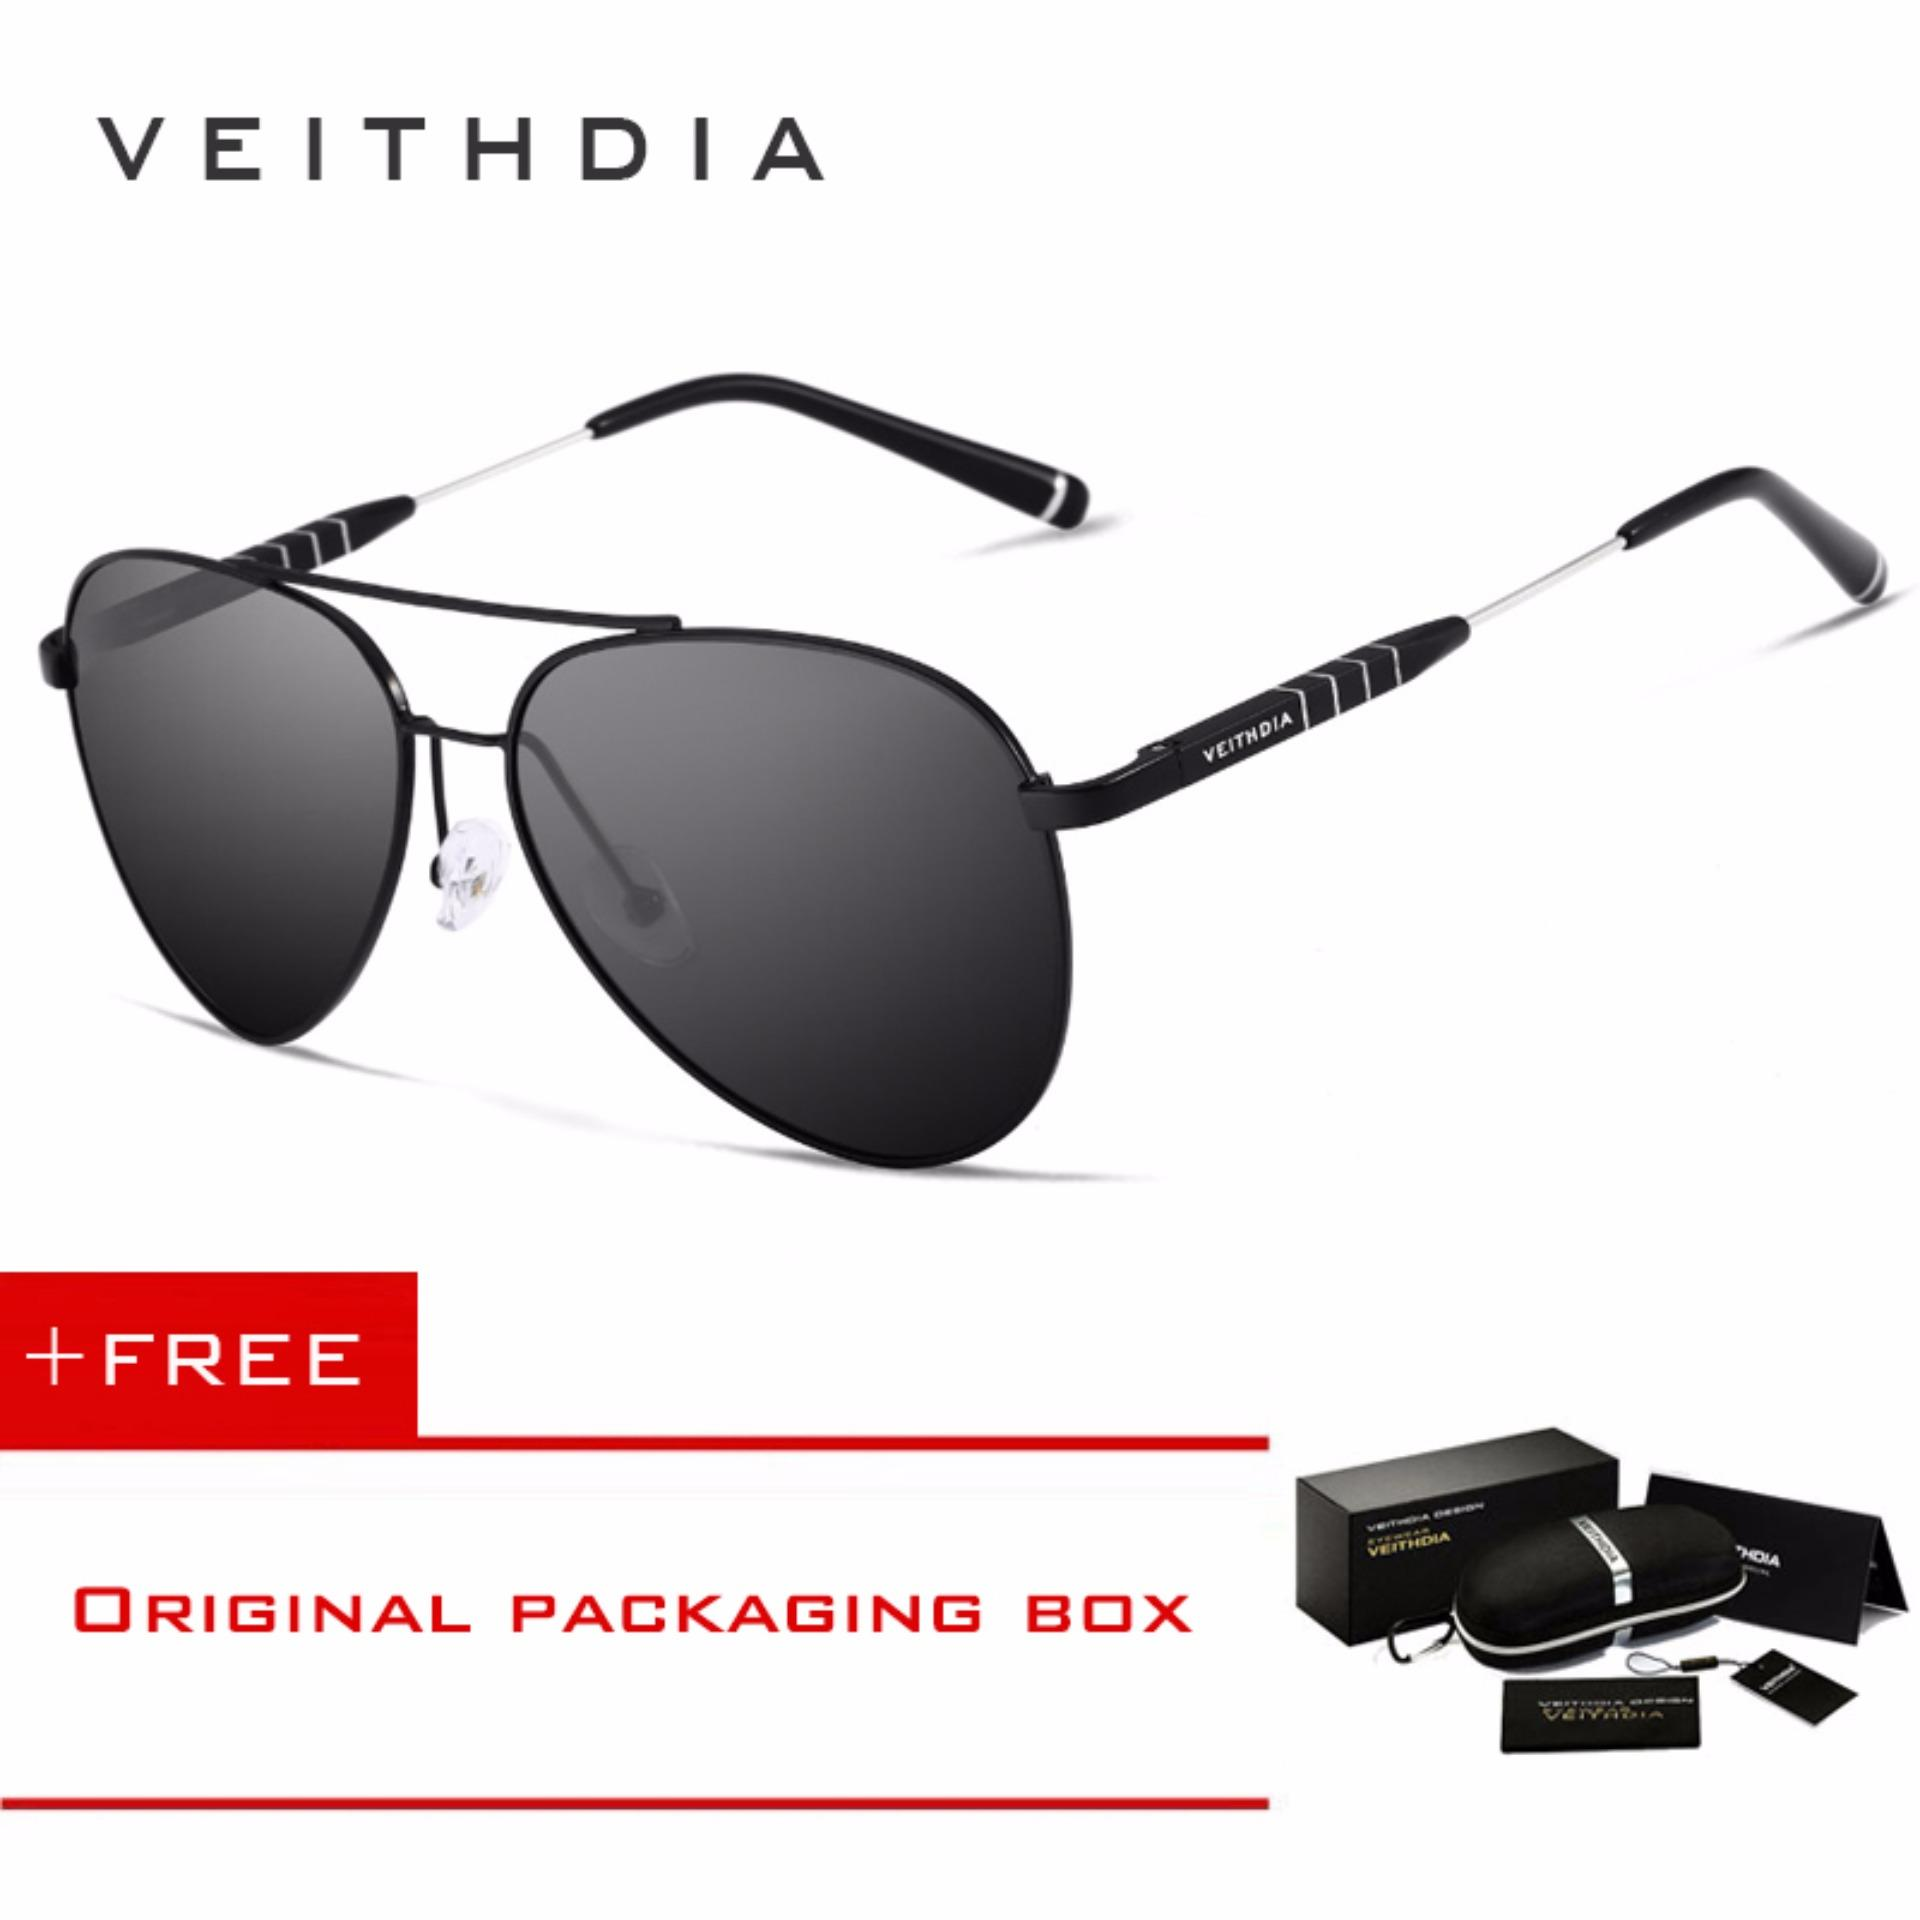 Jual Veithdia Fashion Merek Unisex Desain Aluminium Pria Berjemur Kacamata Terpolarisasi Cermin Pria Eyewear Kacamata Untuk Wanita China Pria 6698 Beli 1 Mendapatkan 1 Freebie Murah Tiongkok